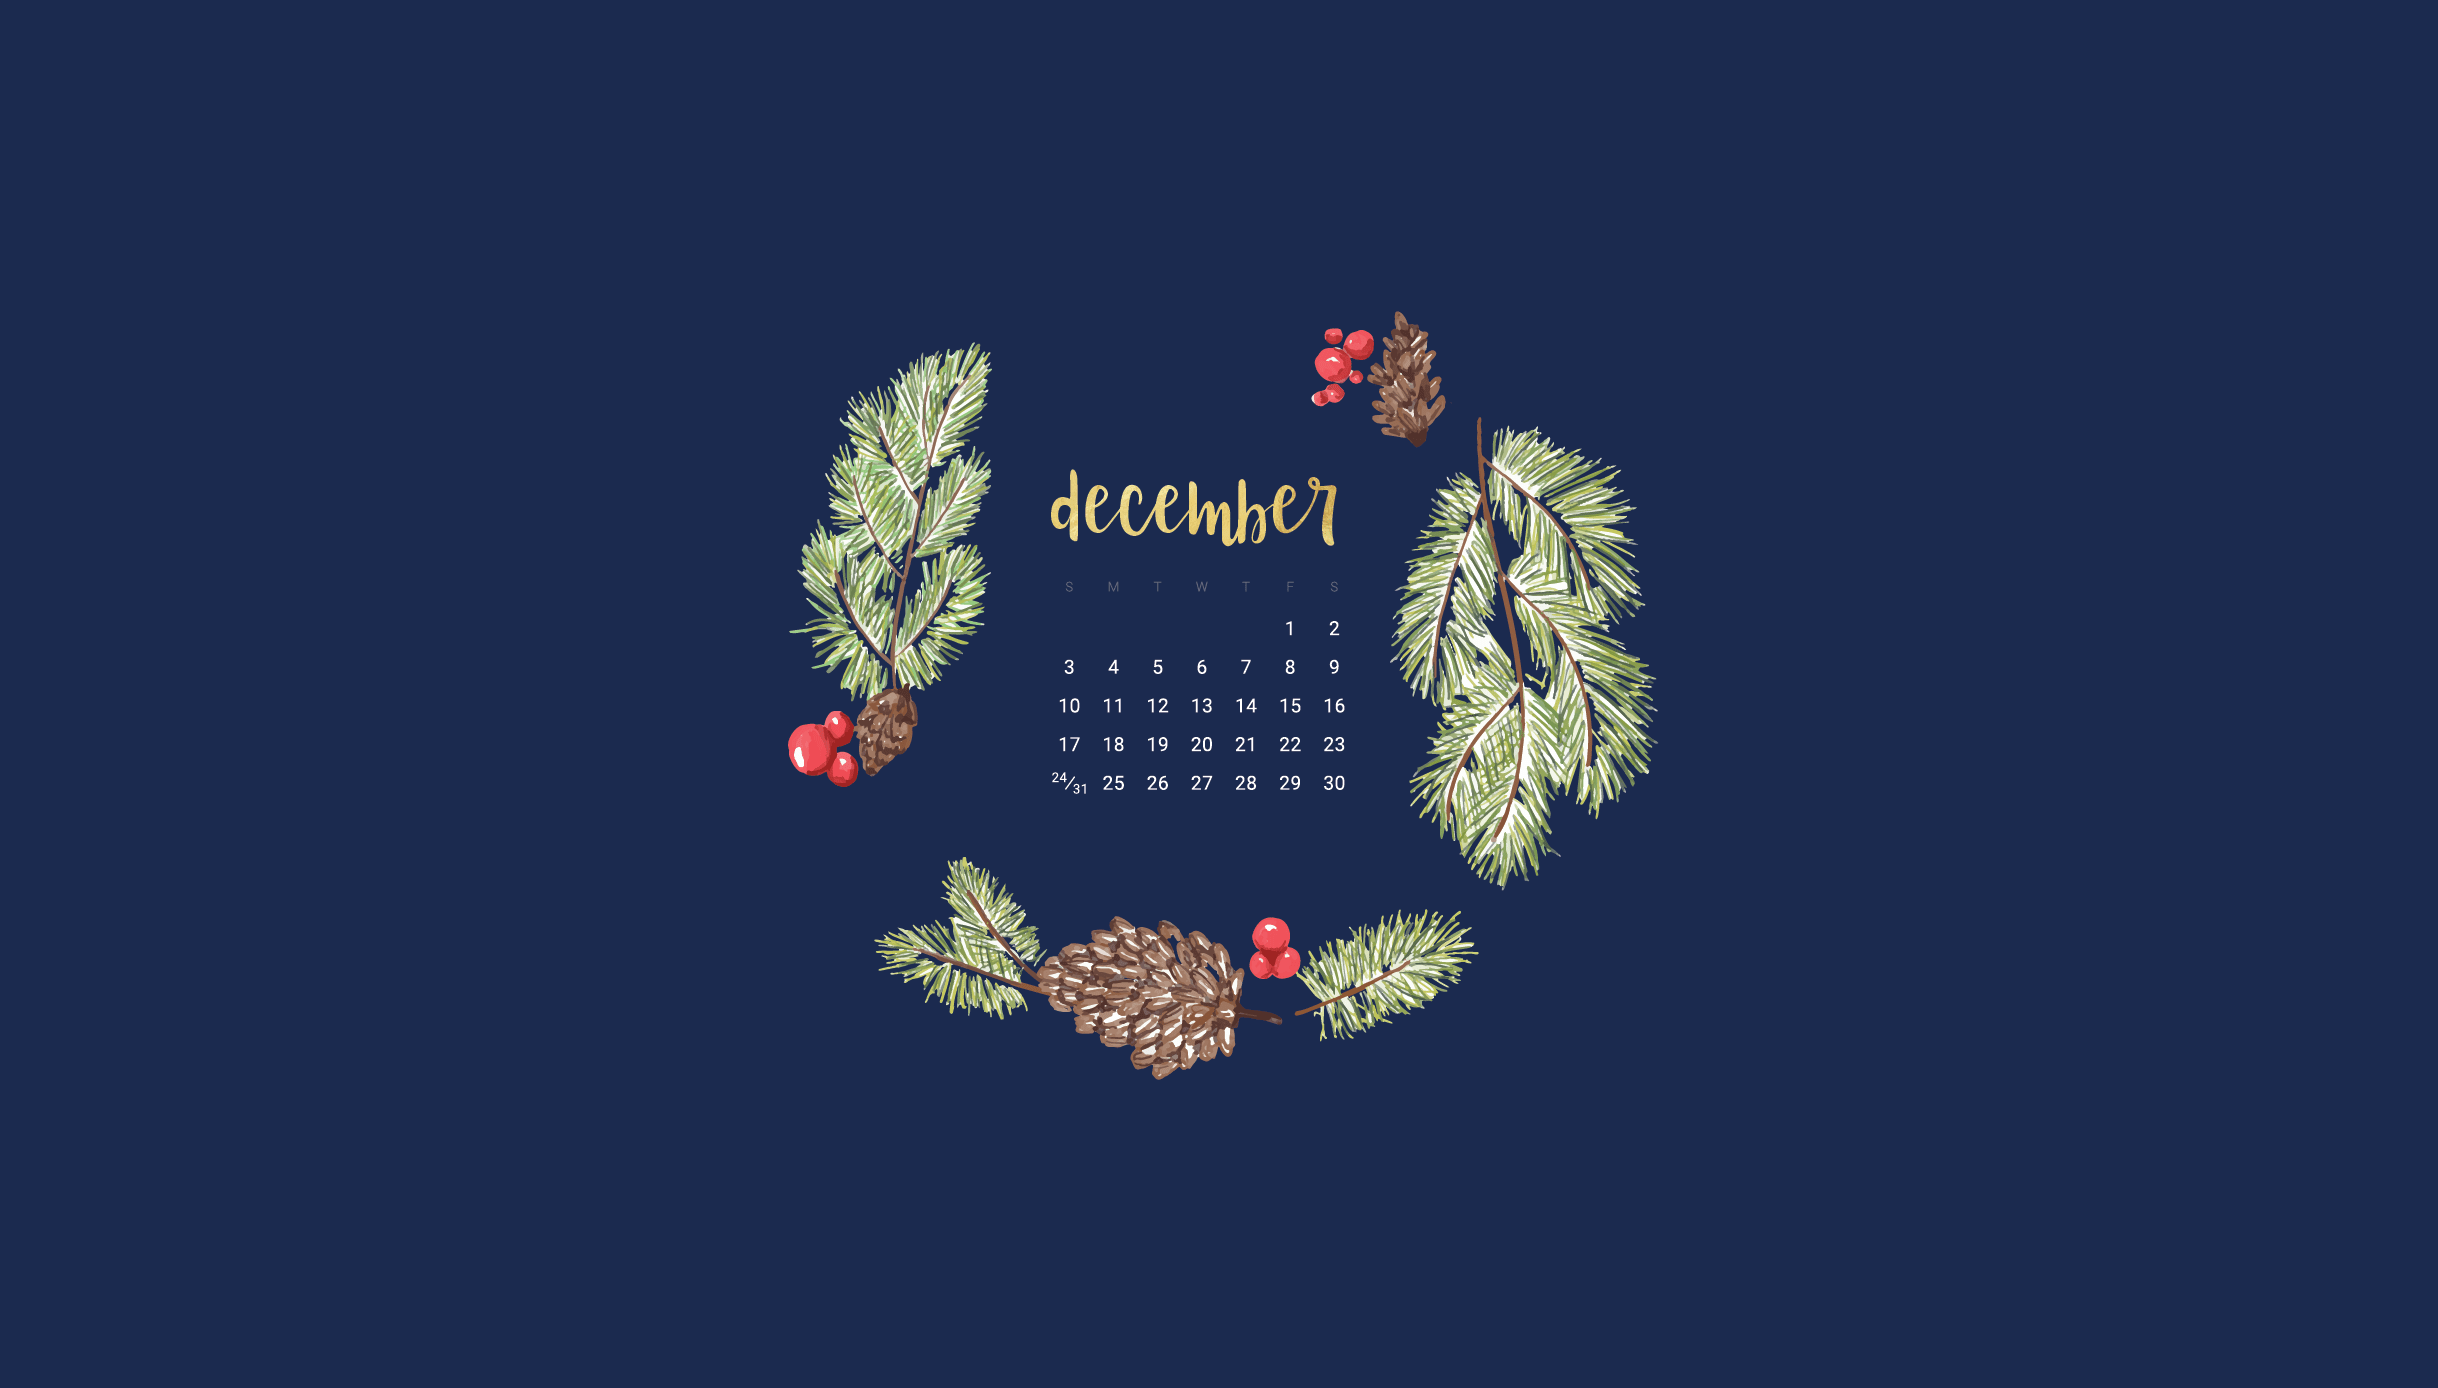 Free December 2017 Desktop And Smart Phone Wallpapers Calendar